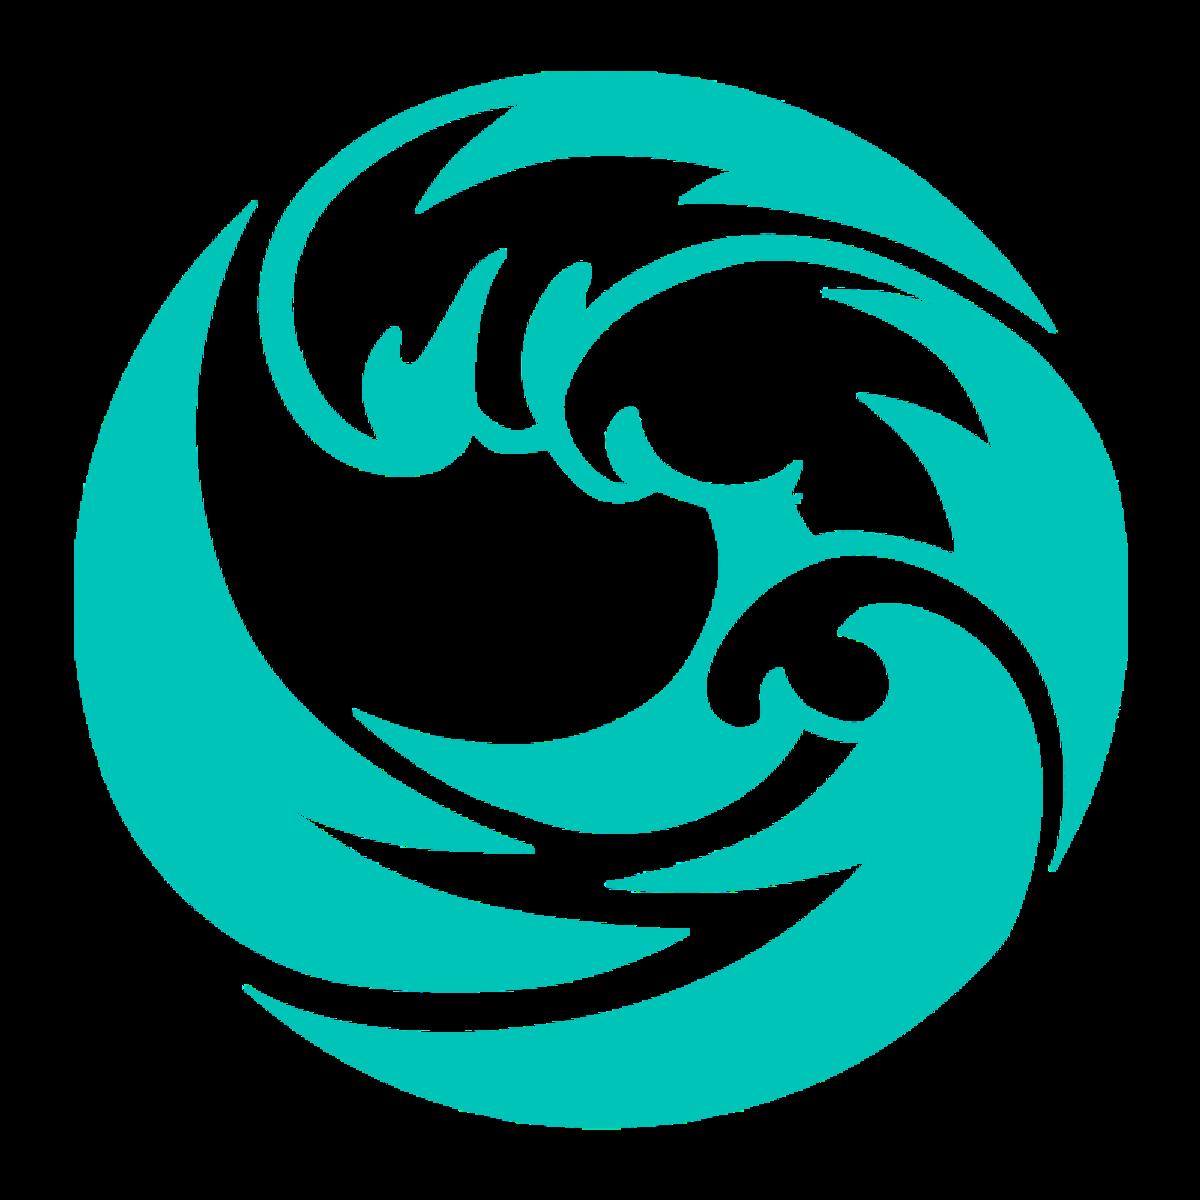 https://s.starladder.com/uploads/team_logo/b/f/e/6/meta_tag_1353ba2b8400bec667d3df78178dacce.png логотип